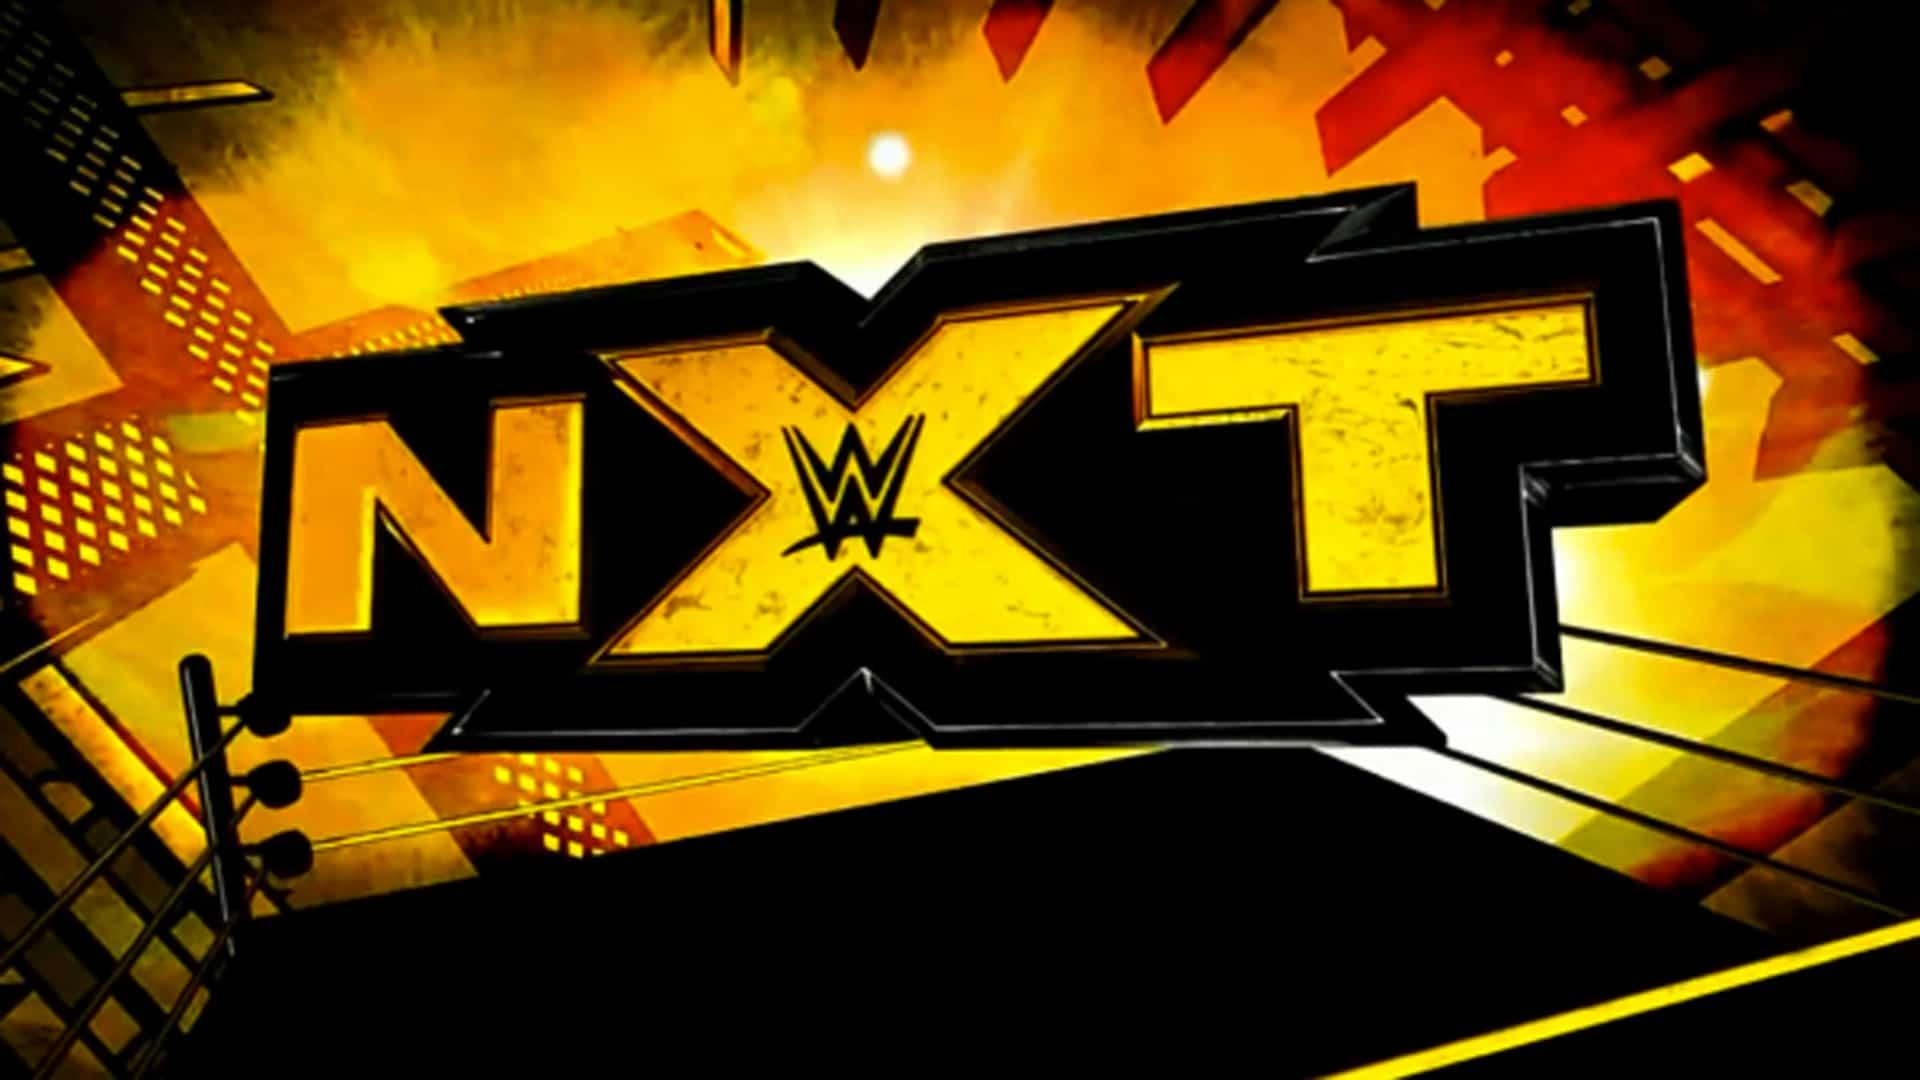 wwe-nxt-logo-041415-wwe-ftr_1eyy8mblkajvh1i8w40p6dgs5t